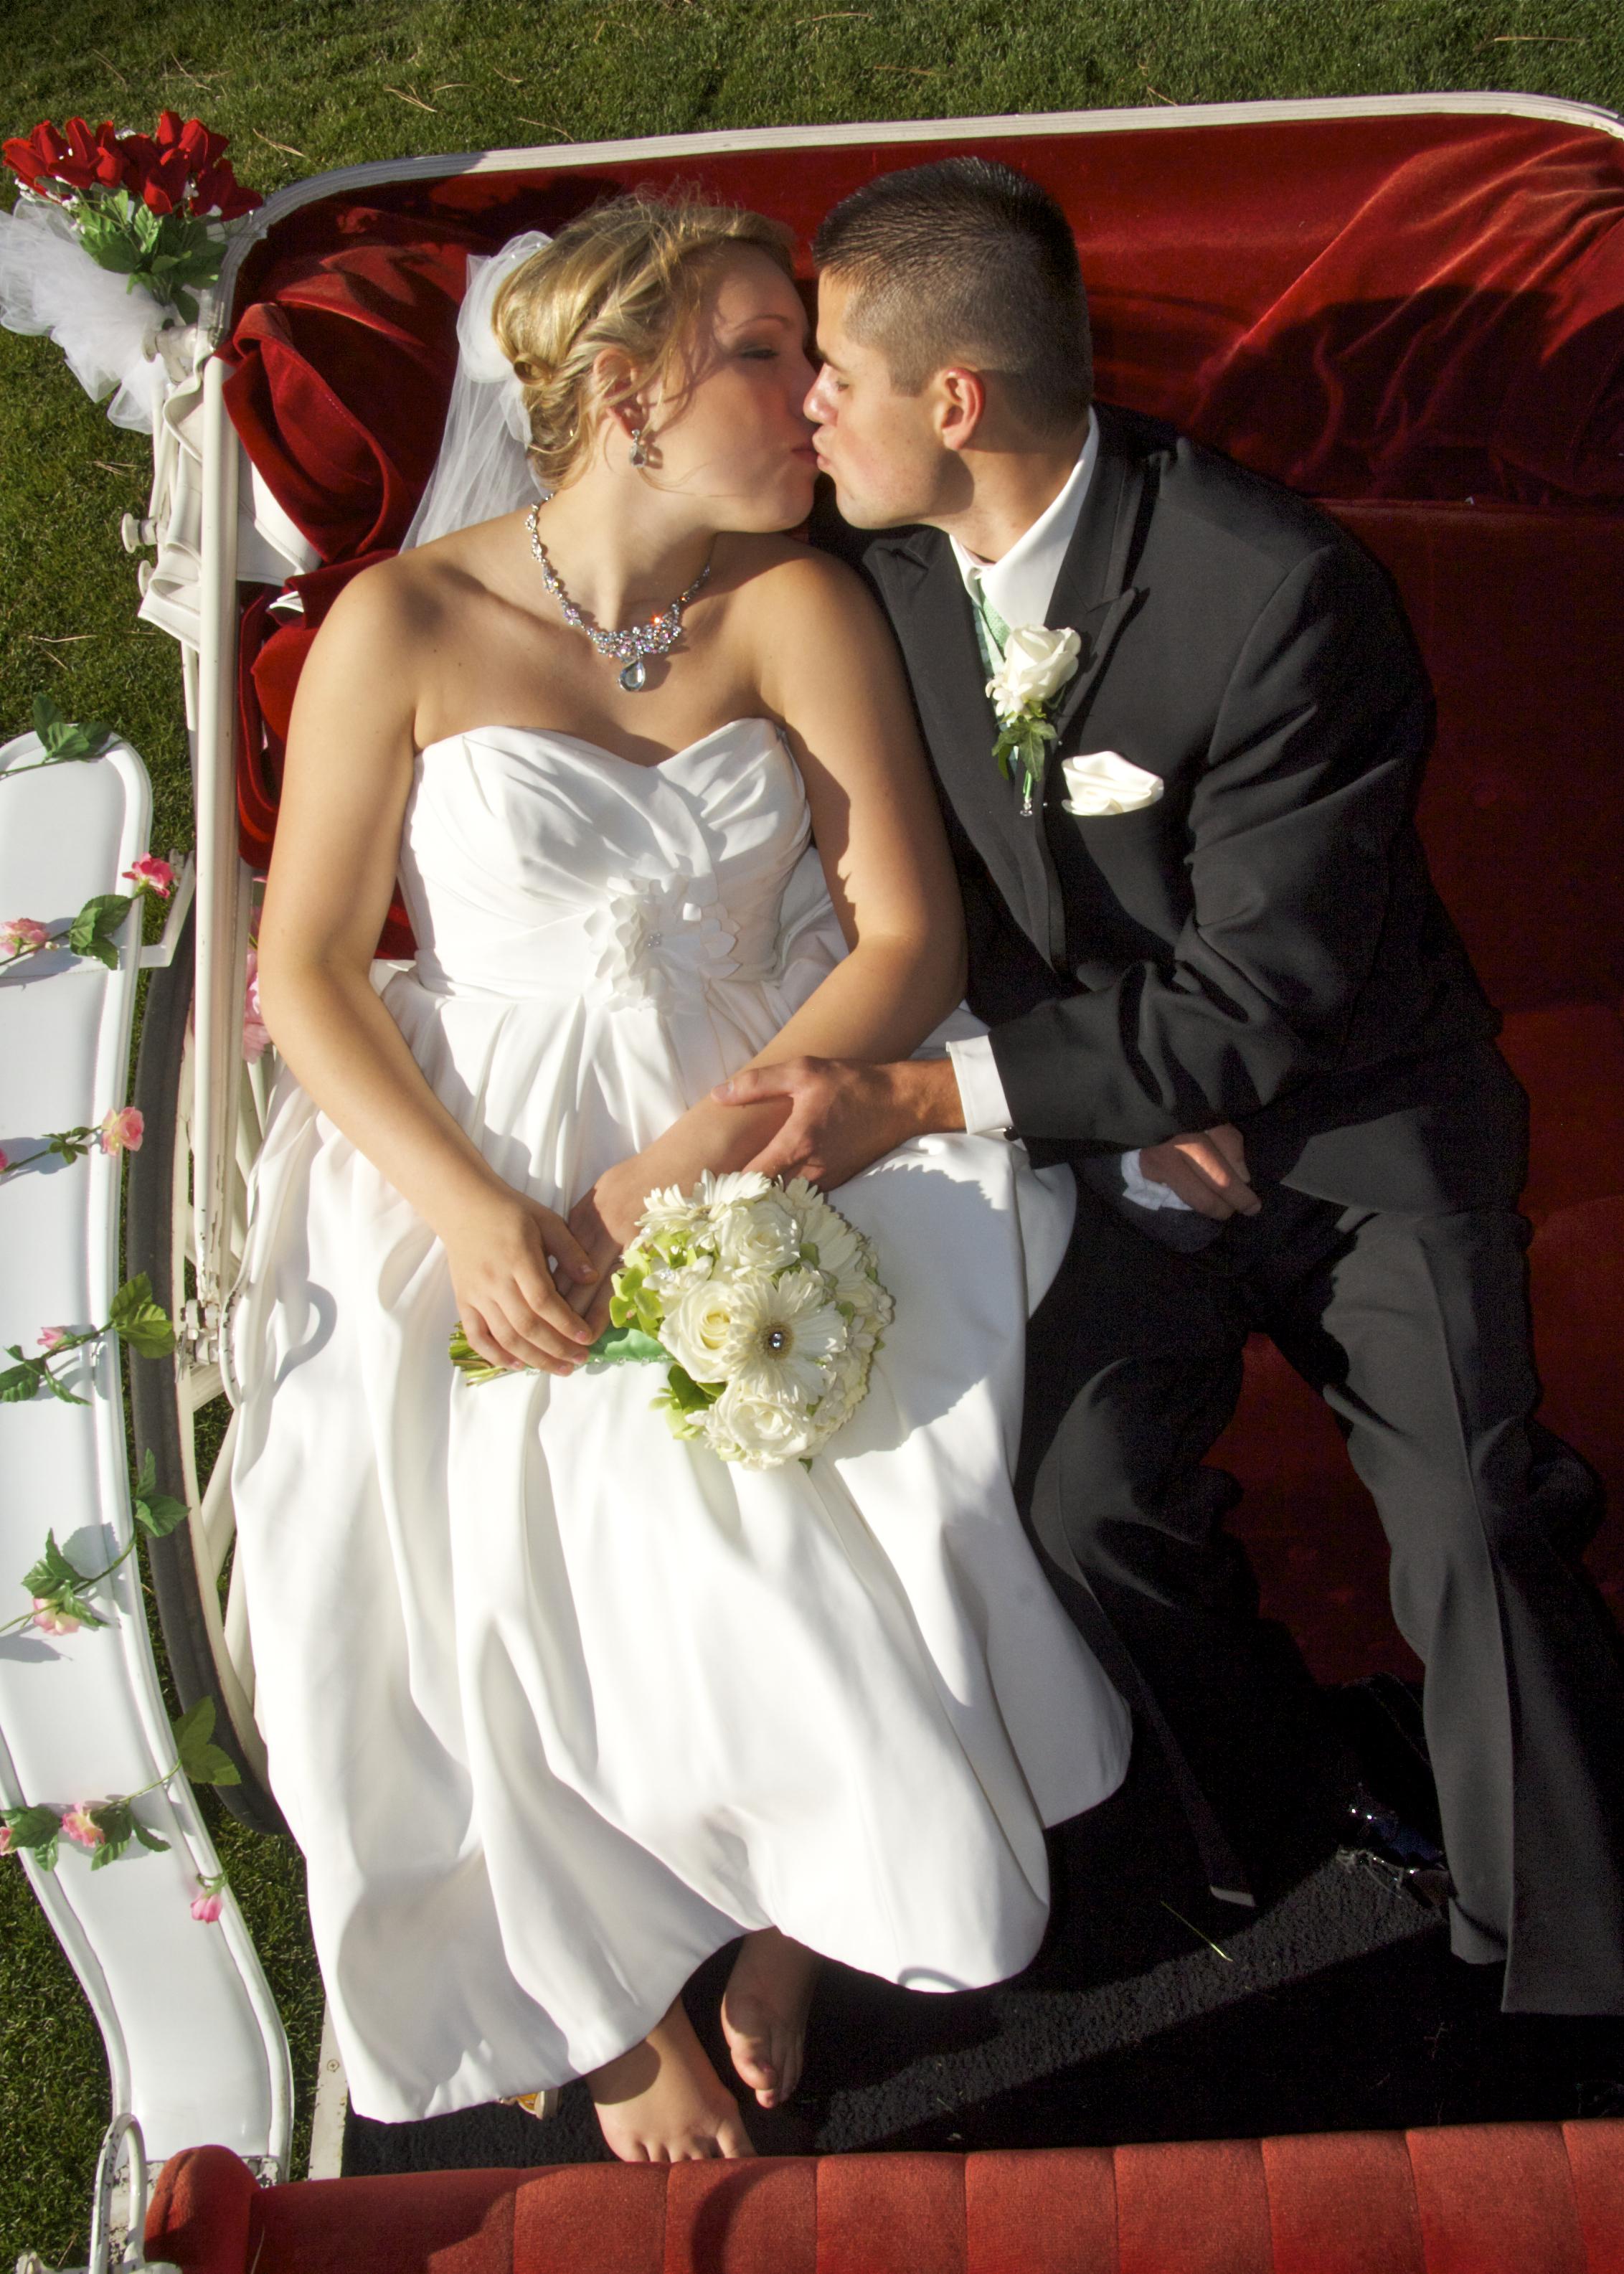 Wedding Photographer Bride and Groom063.